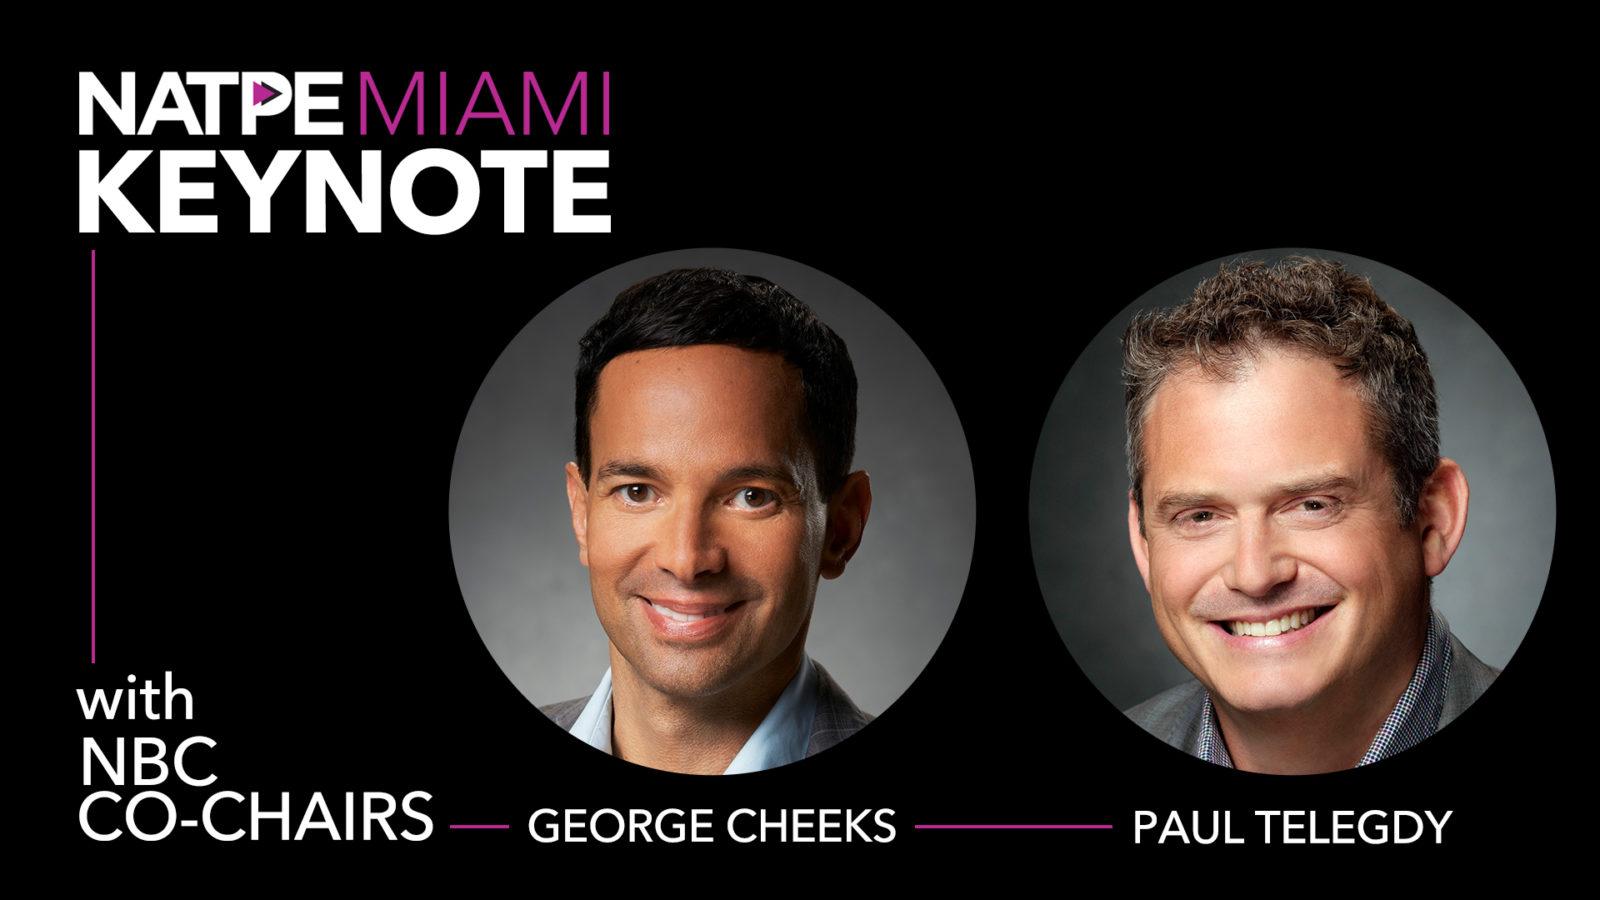 NBC Co-Chairs George Cheeks and Paul Telegdy